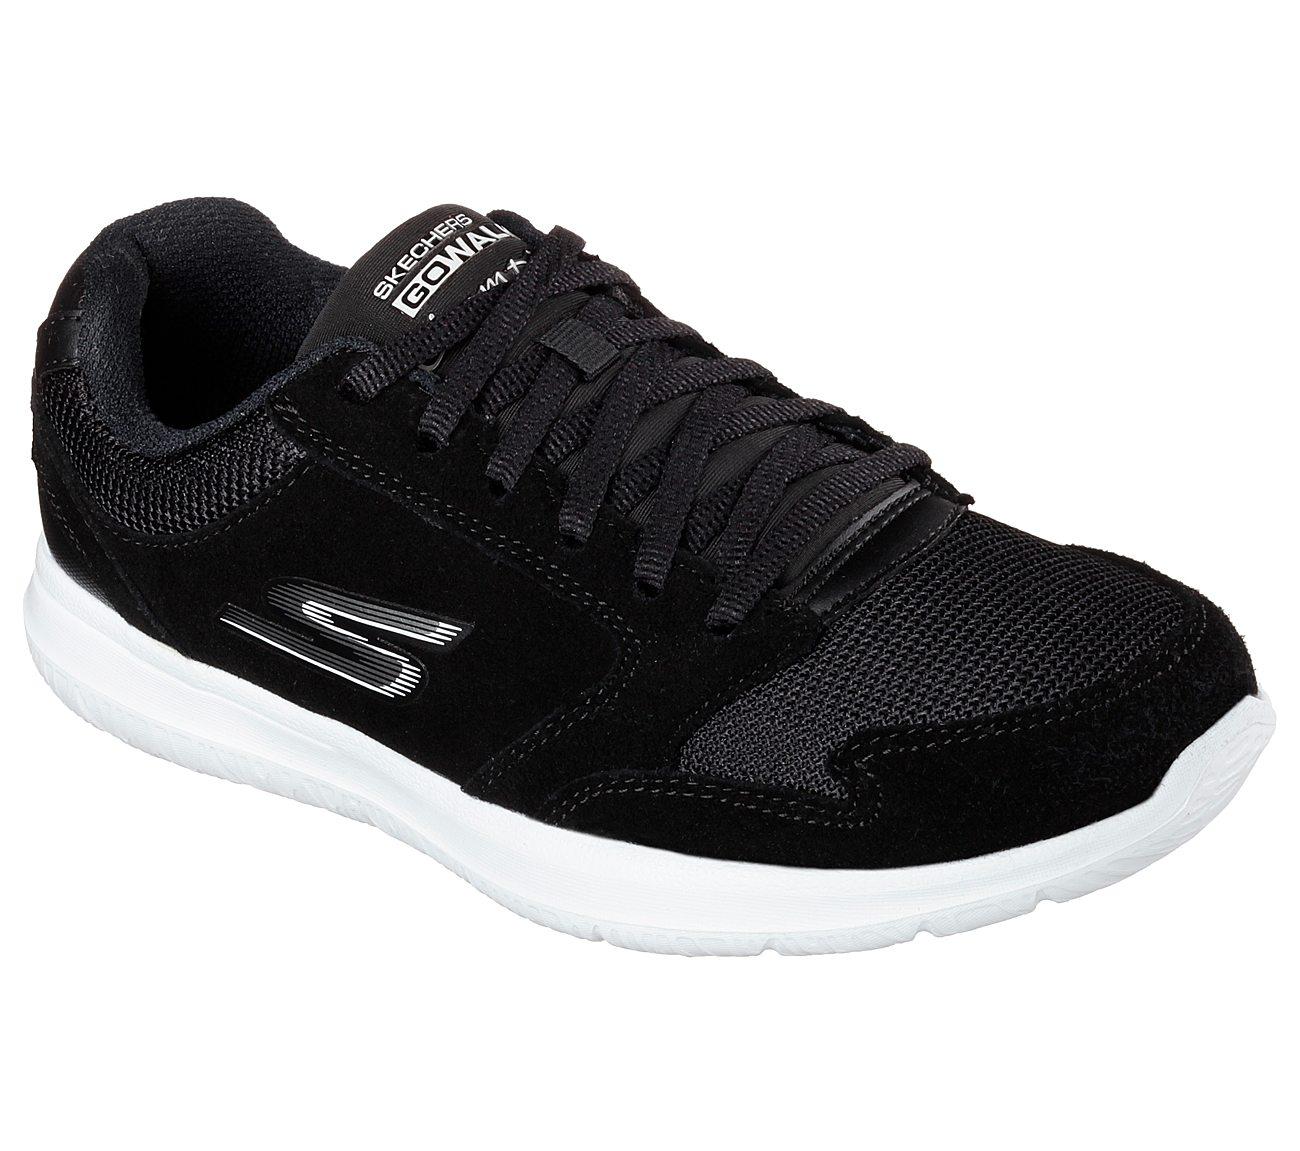 9750ff1d778 Buy SKECHERS Skechers GOwalk City - Champion GOwalk Shoes only  75.00